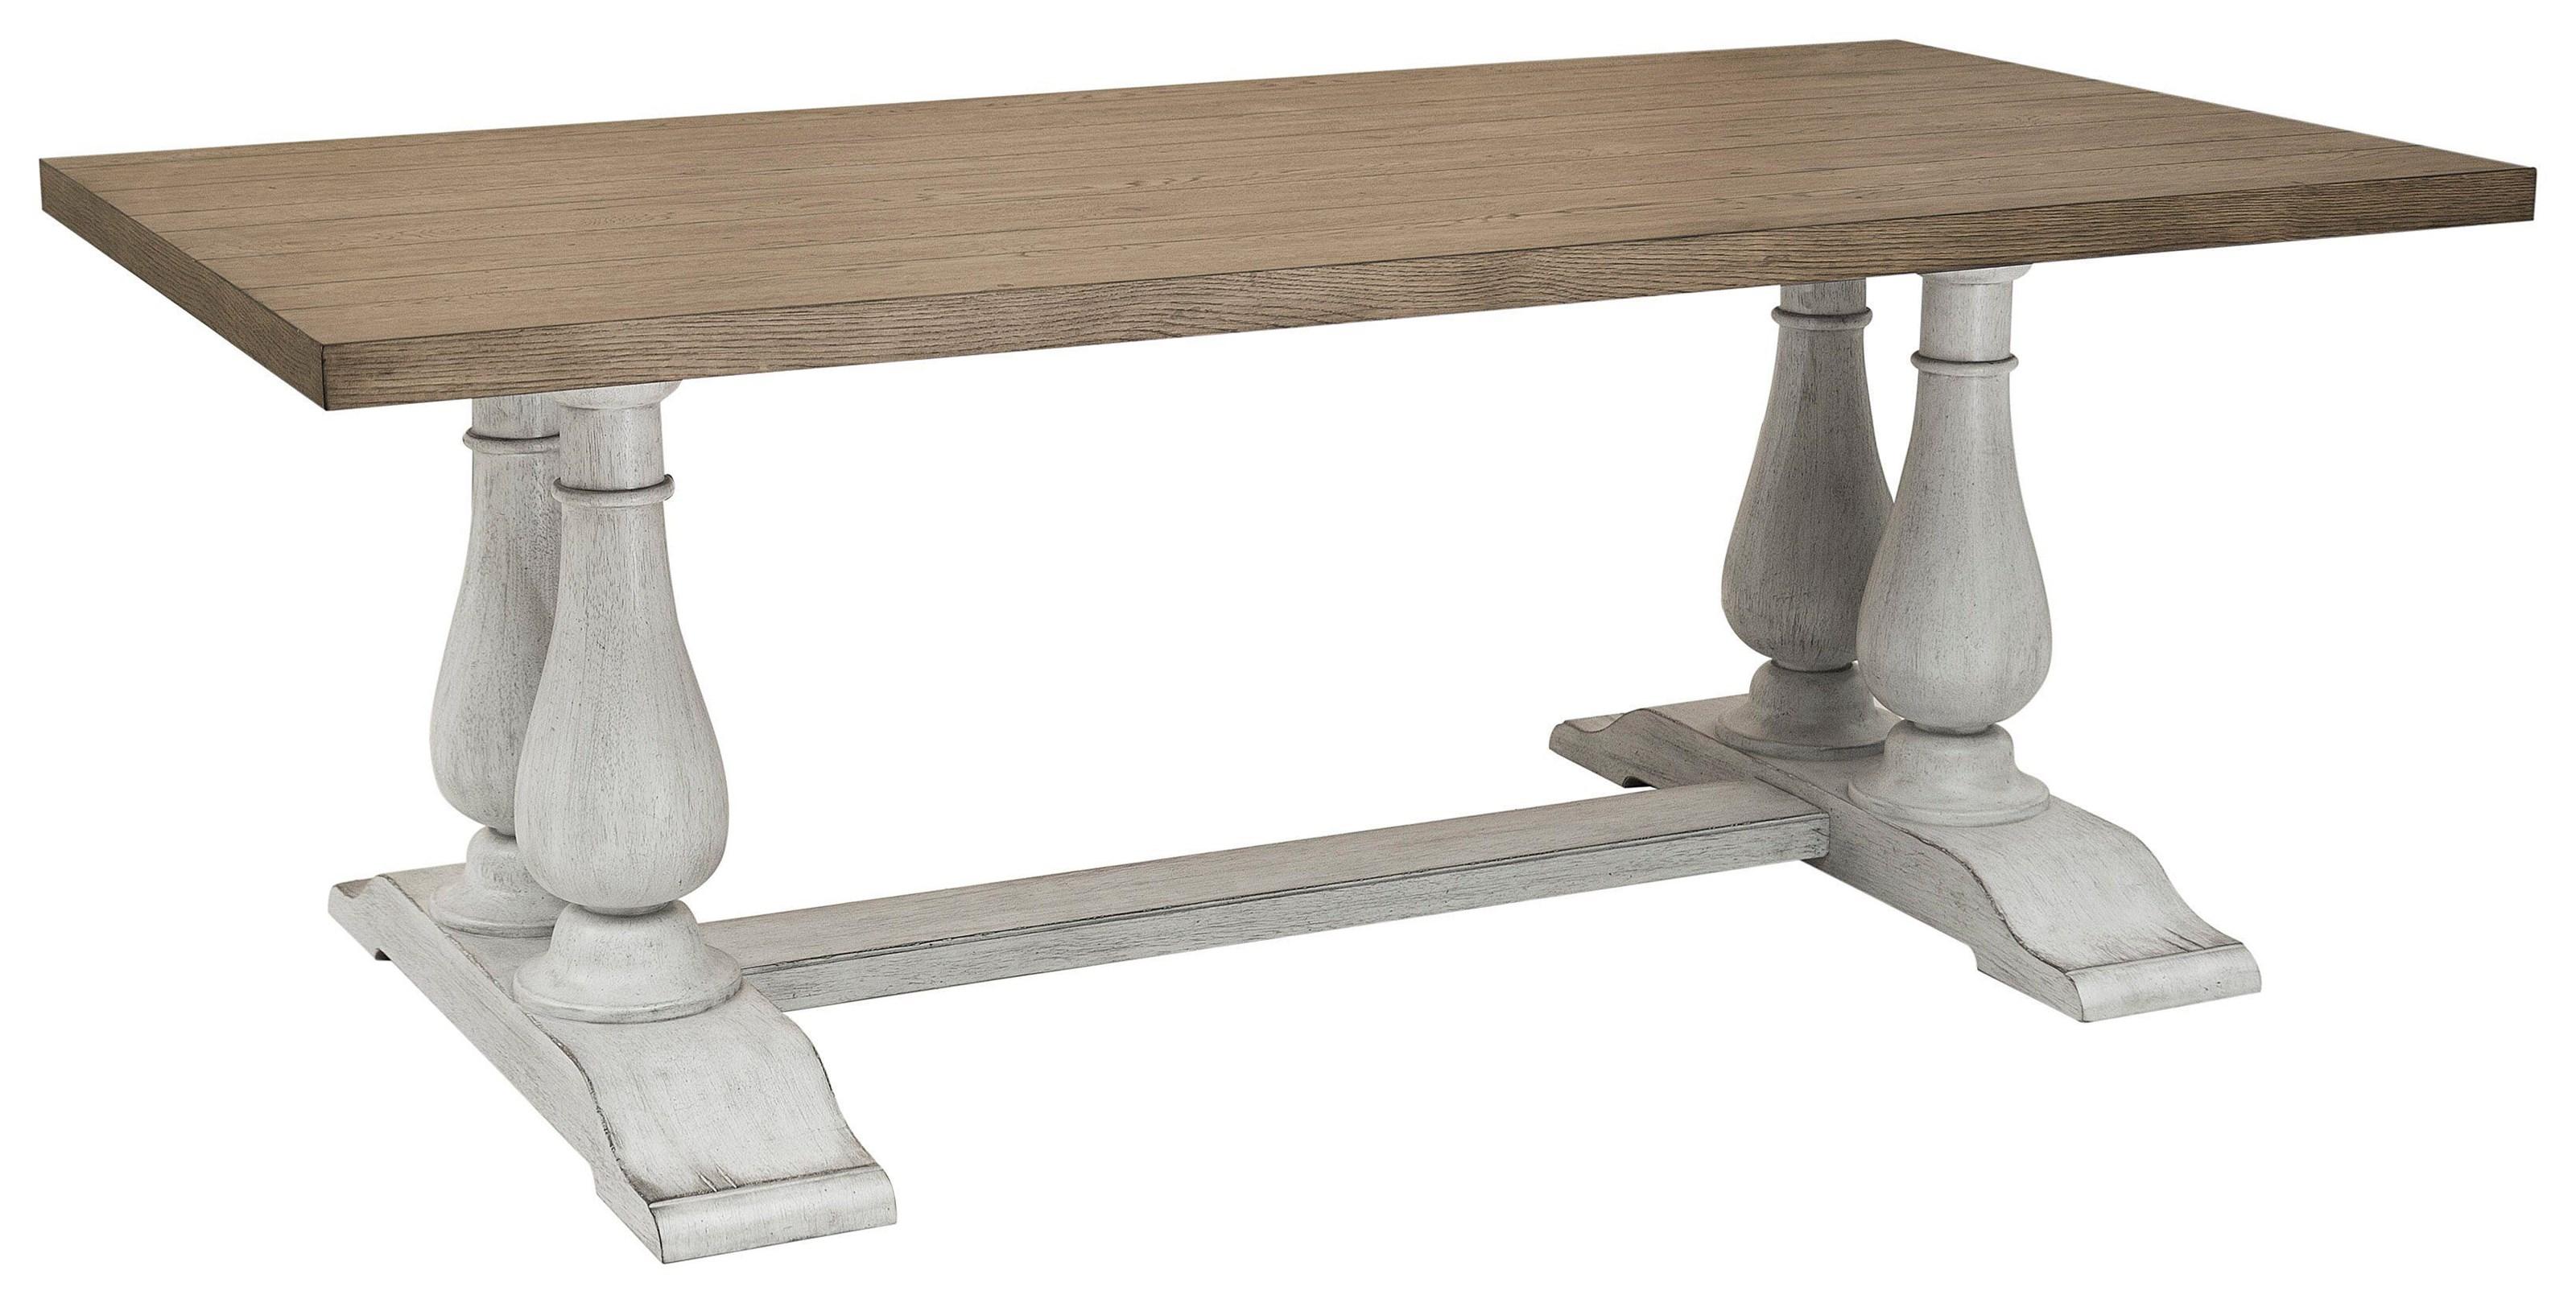 Modern Authentics Dining Table by Pulaski Furniture at Stoney Creek Furniture